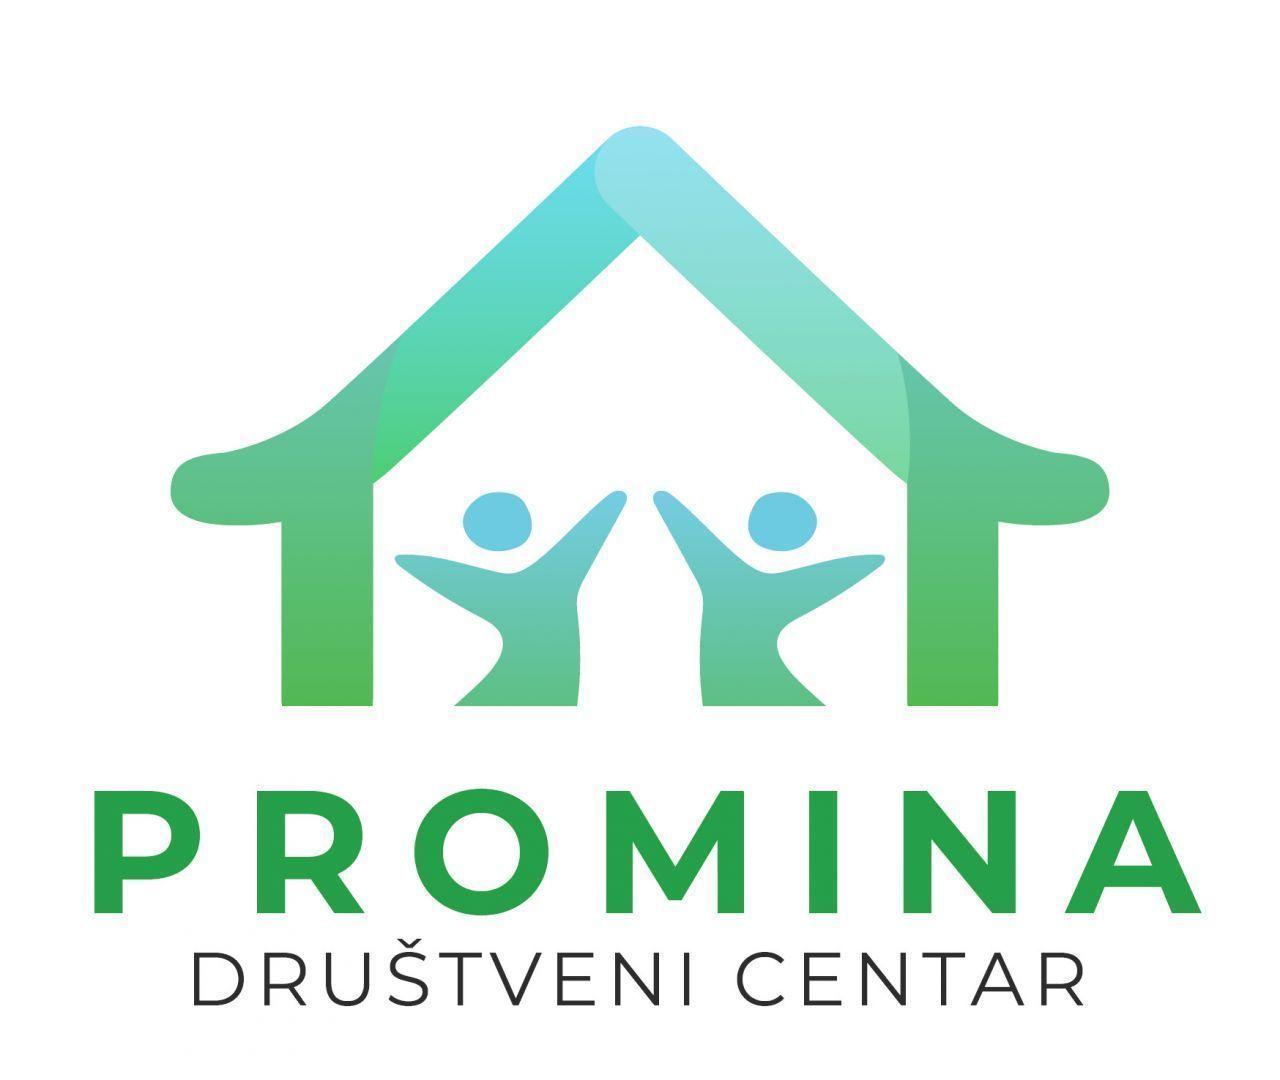 Društveni centar Promina - kalendar događanja za 07/2021.